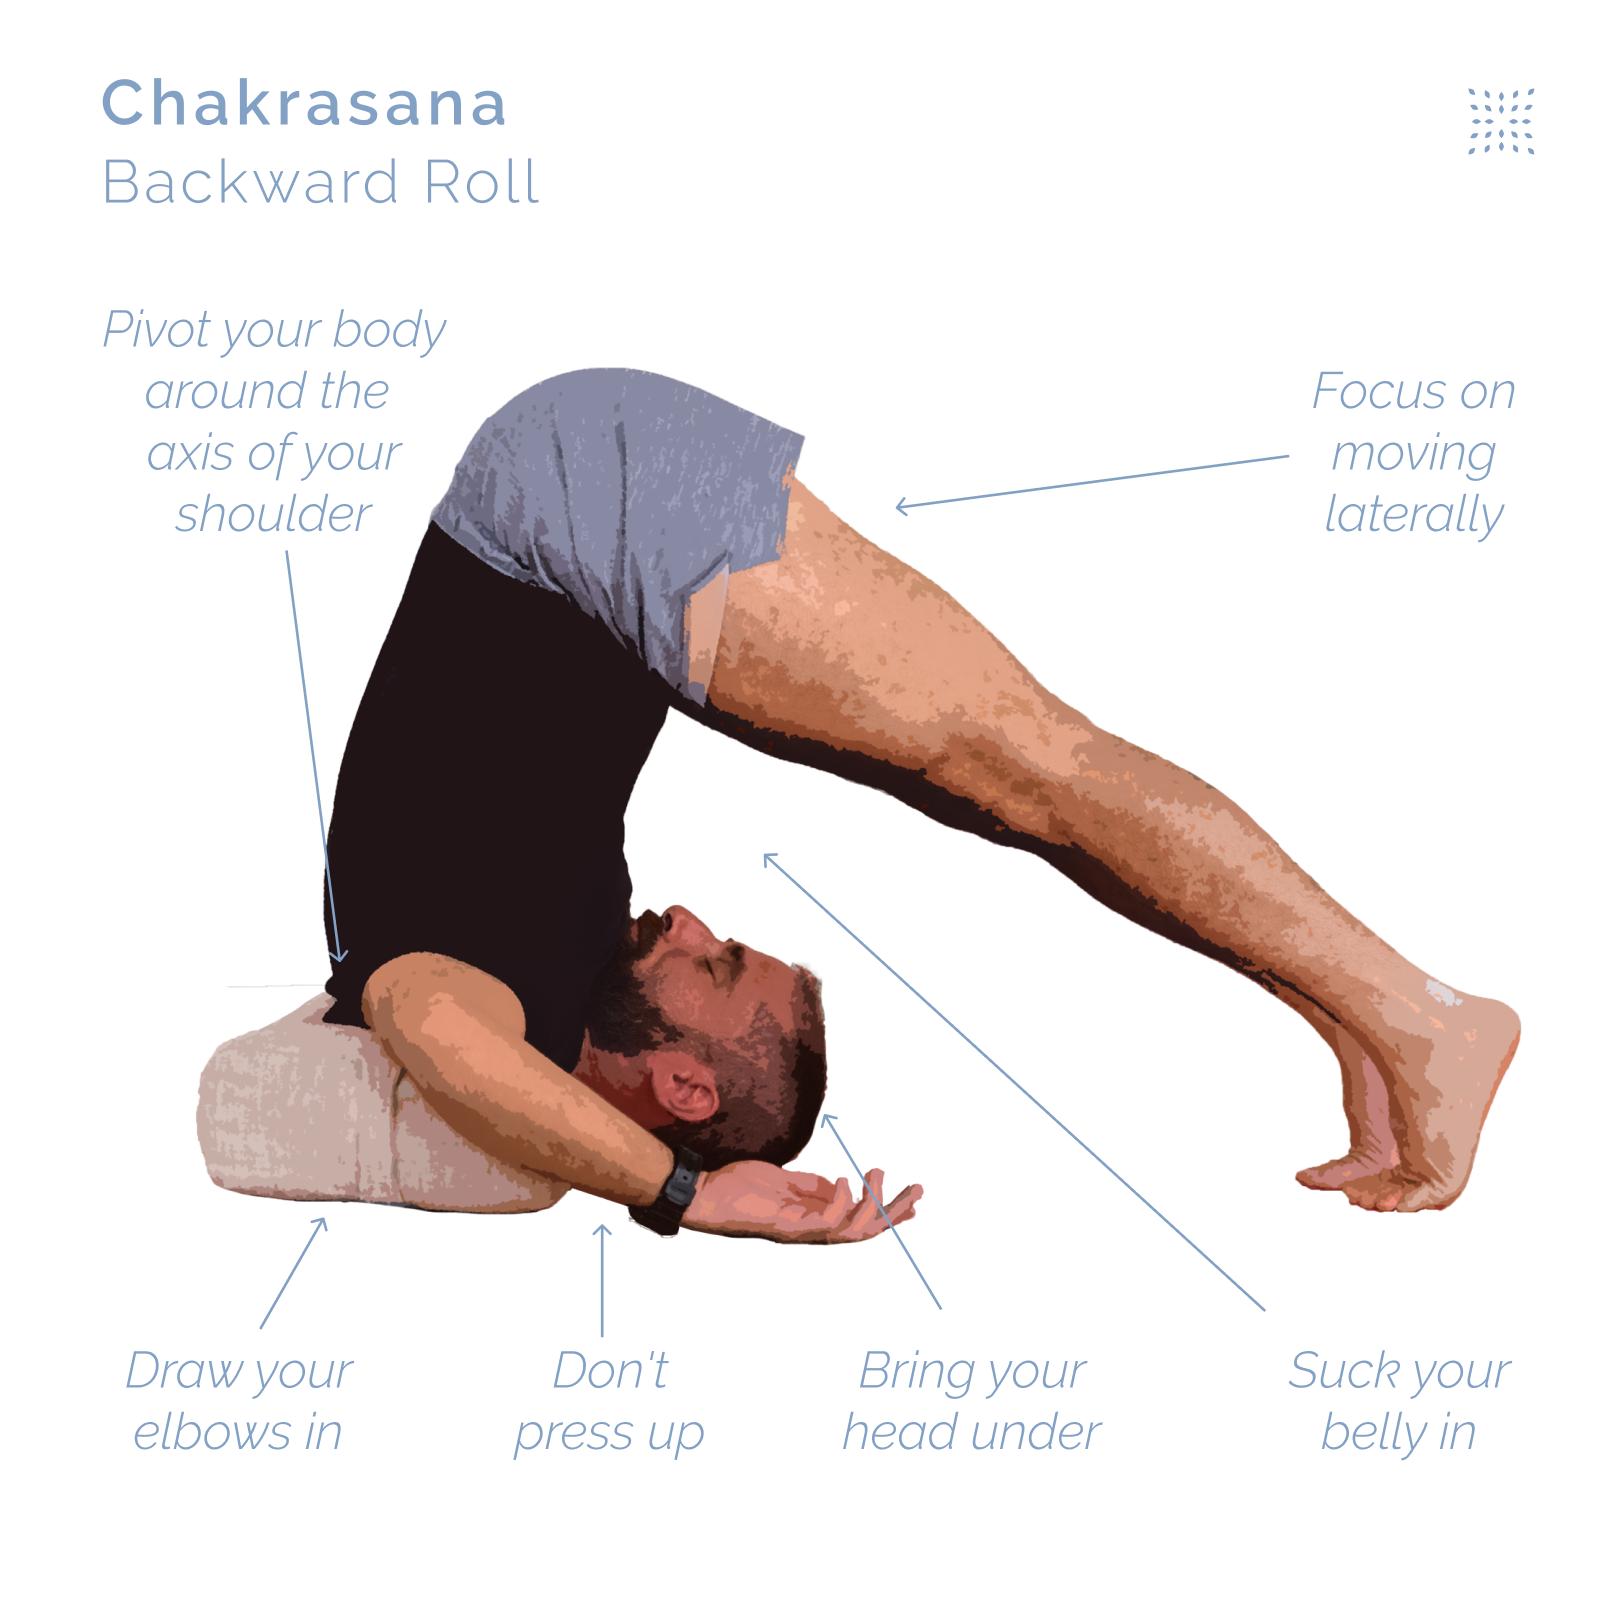 Weekly Pose Tutorial: Chakrasana (Backward Roll)